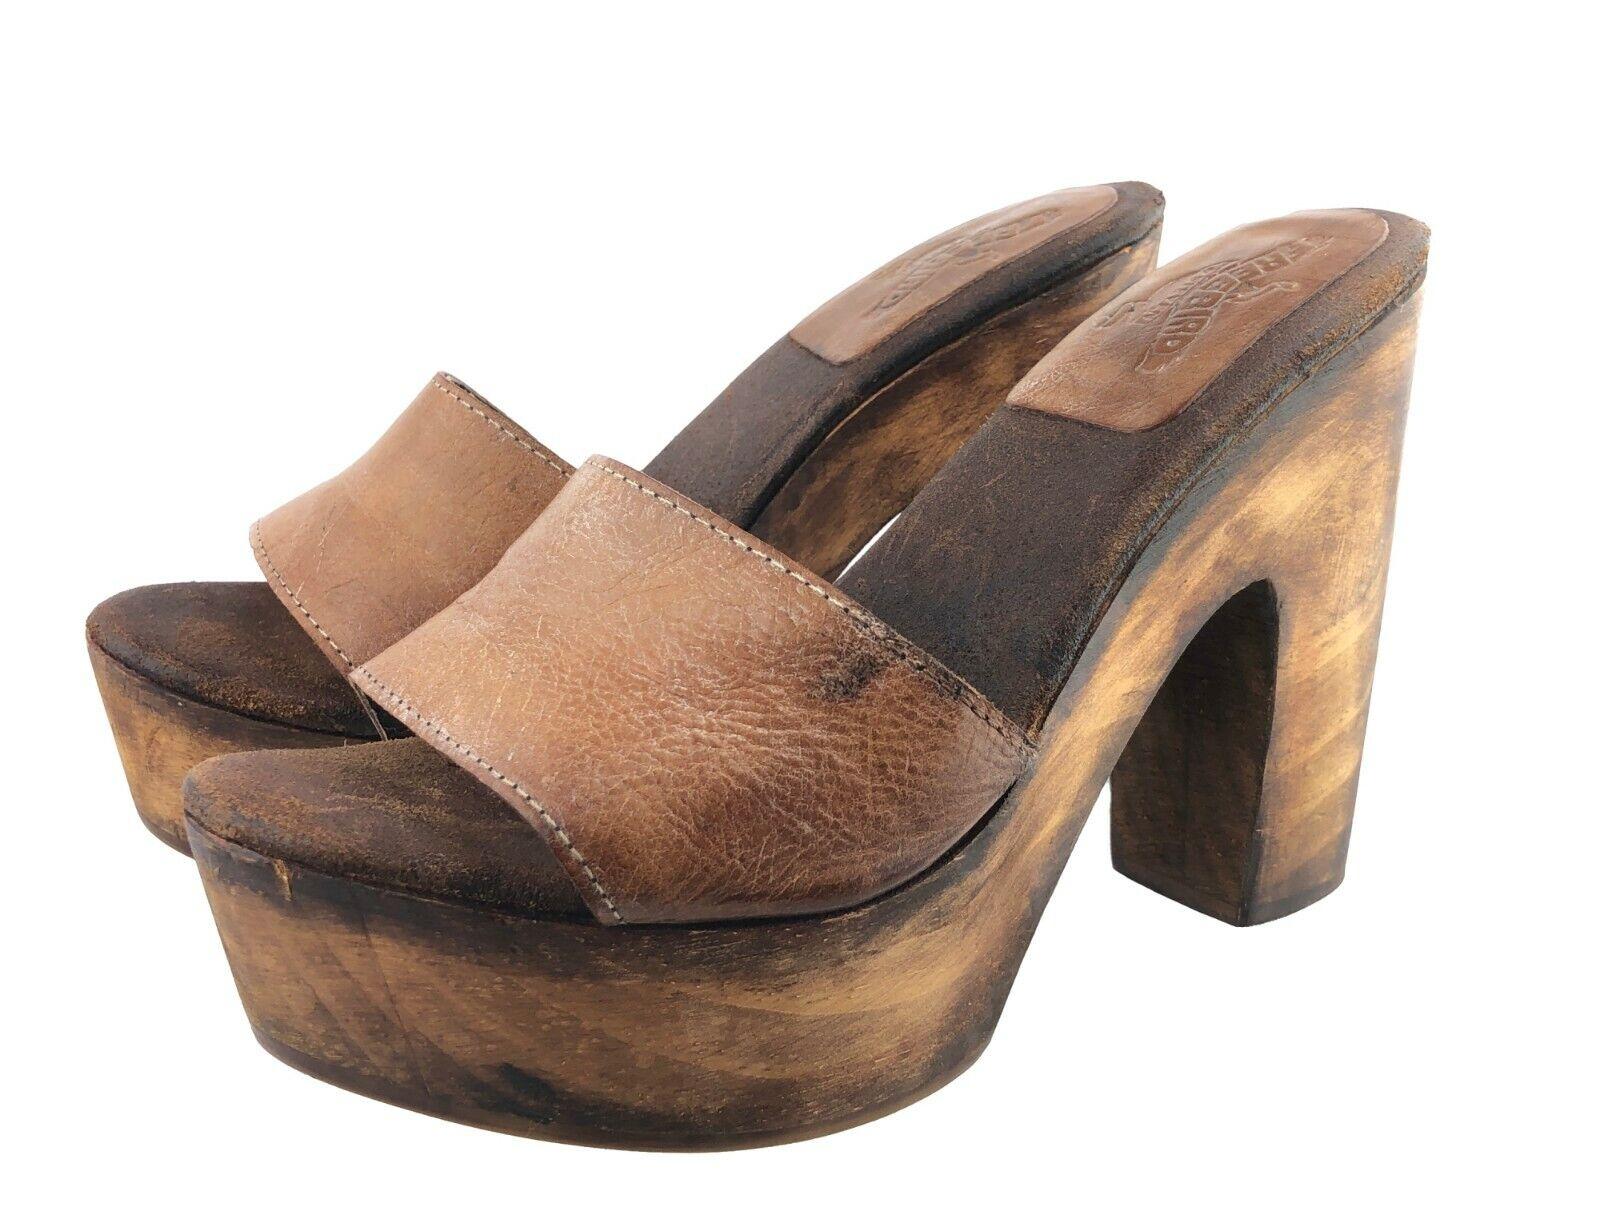 Freebird by Steven Cuba Cognac 5  Heel Wood & Leather Sandals shoes Size 9 Brown